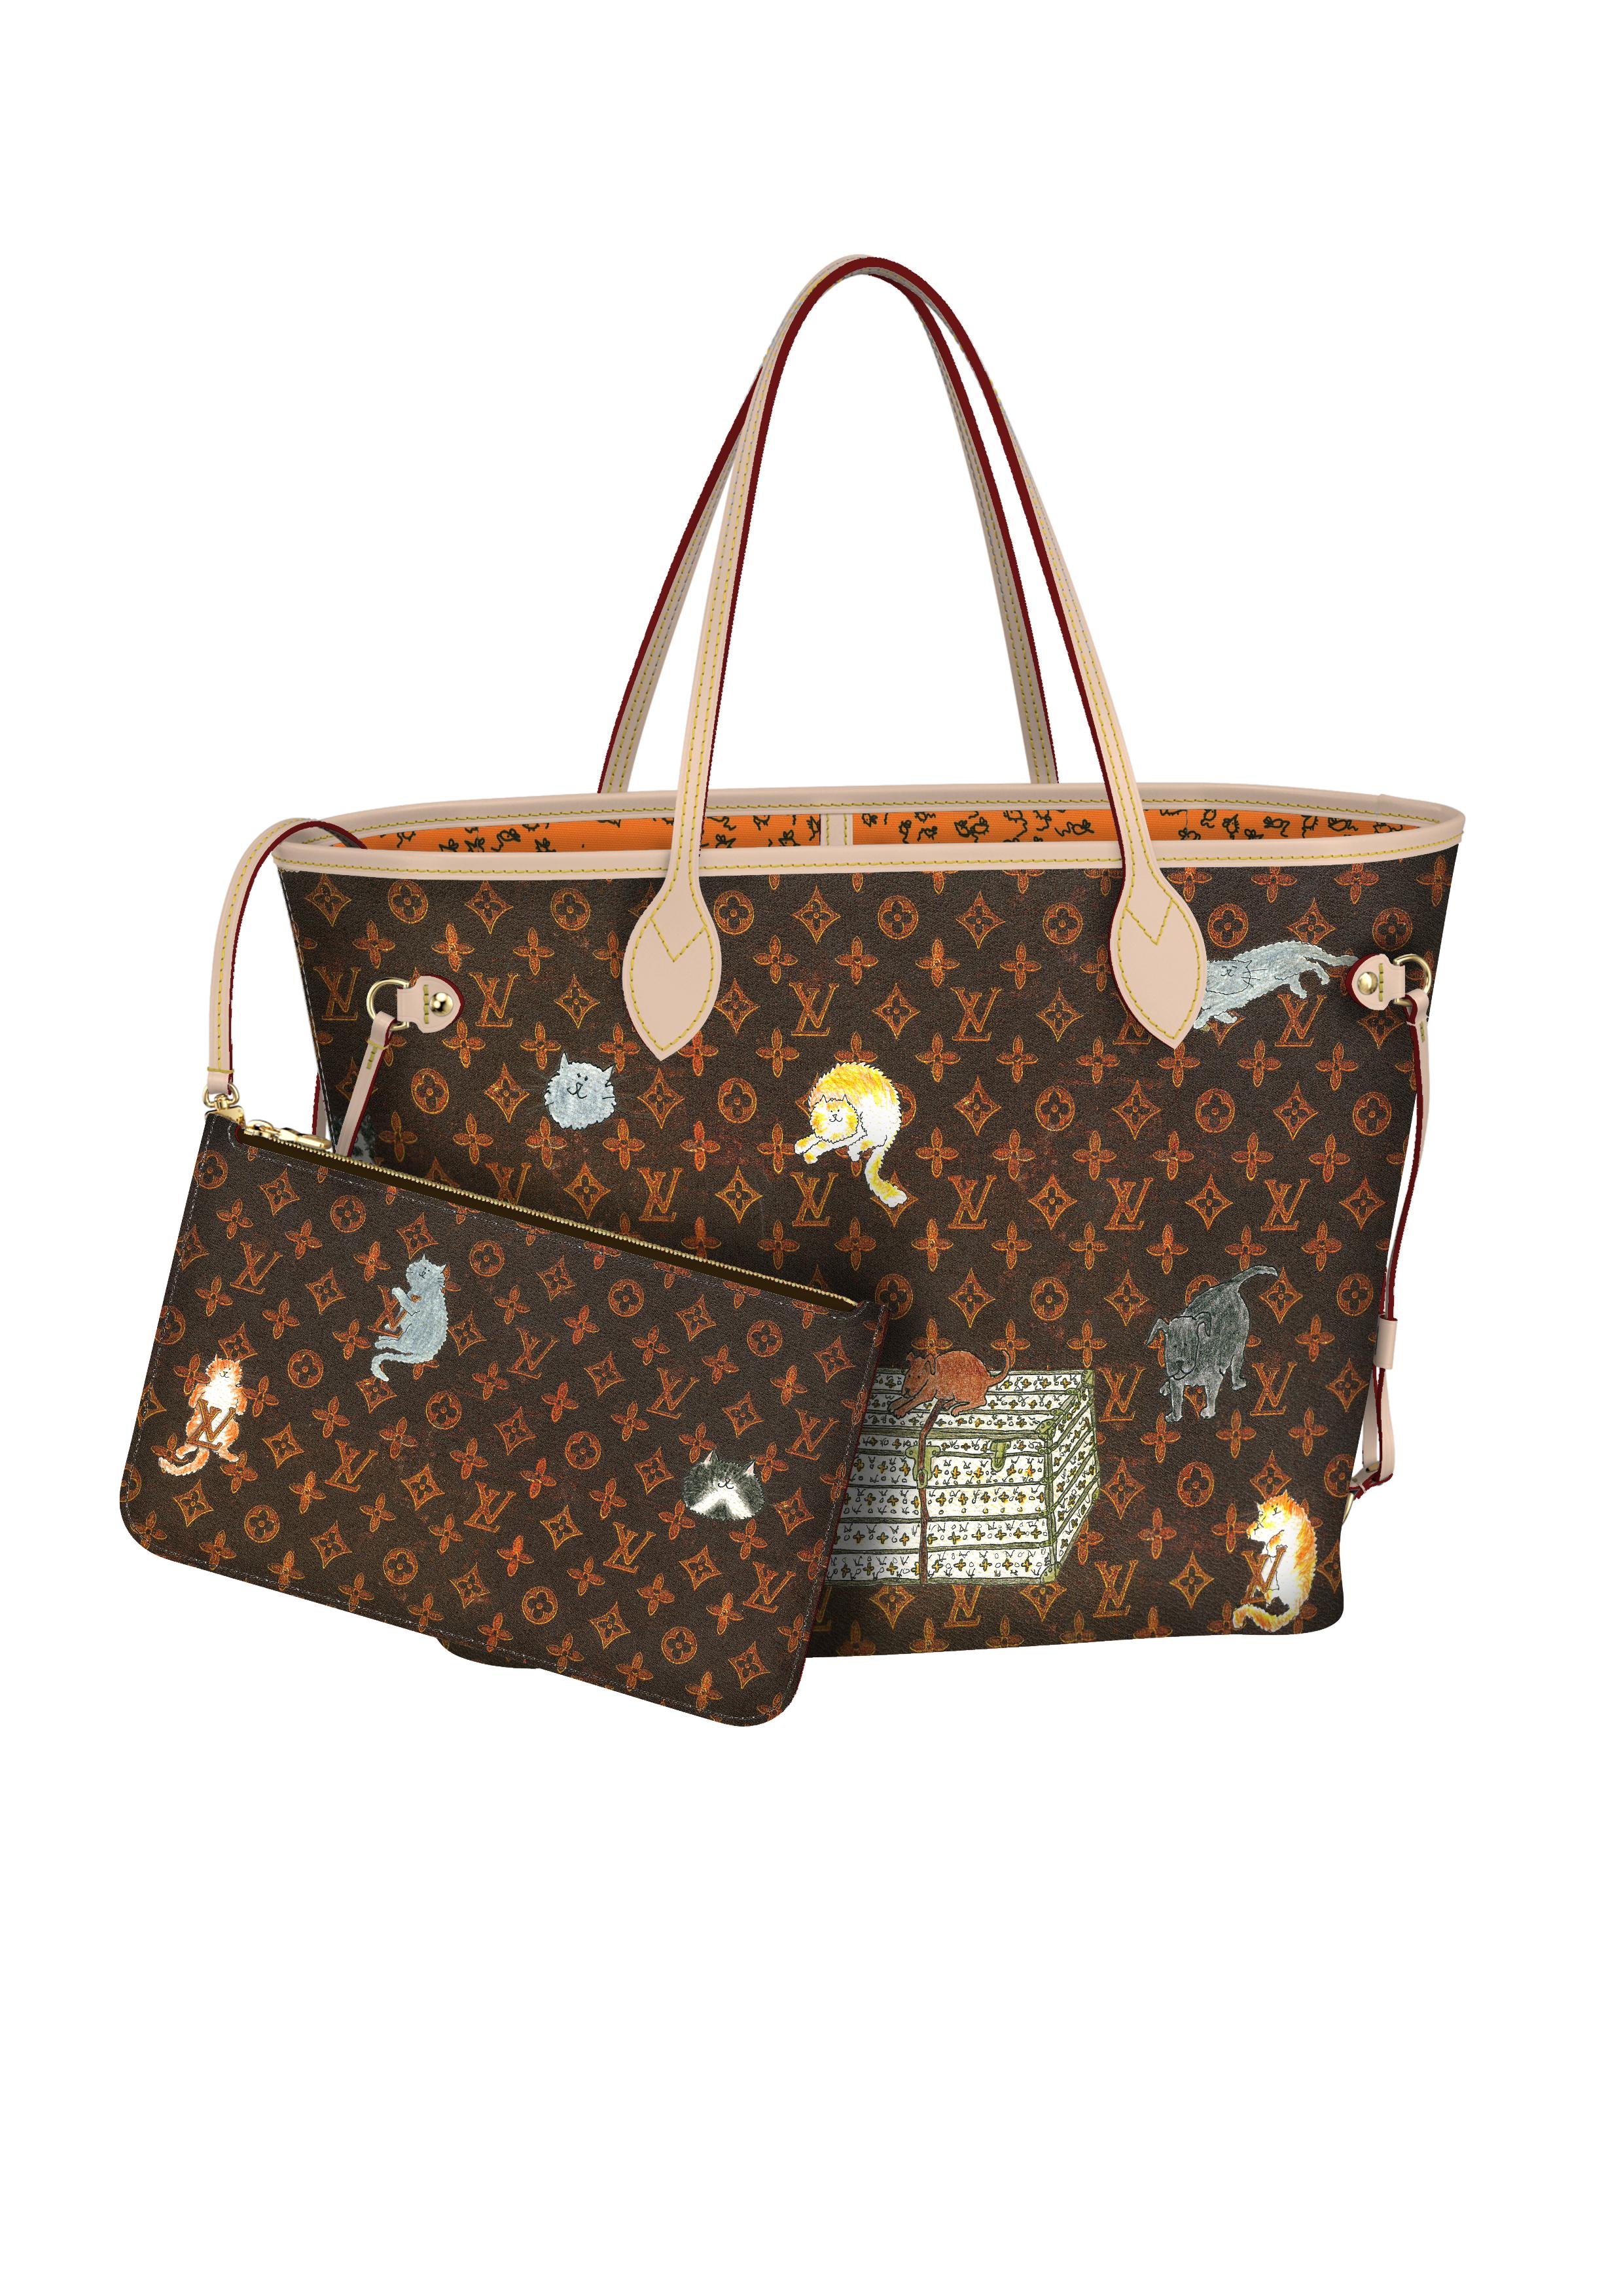 Tote-ally Cute. Louis Vuitton s cult-favorite Neverfull bag ... ae003eb527a6f